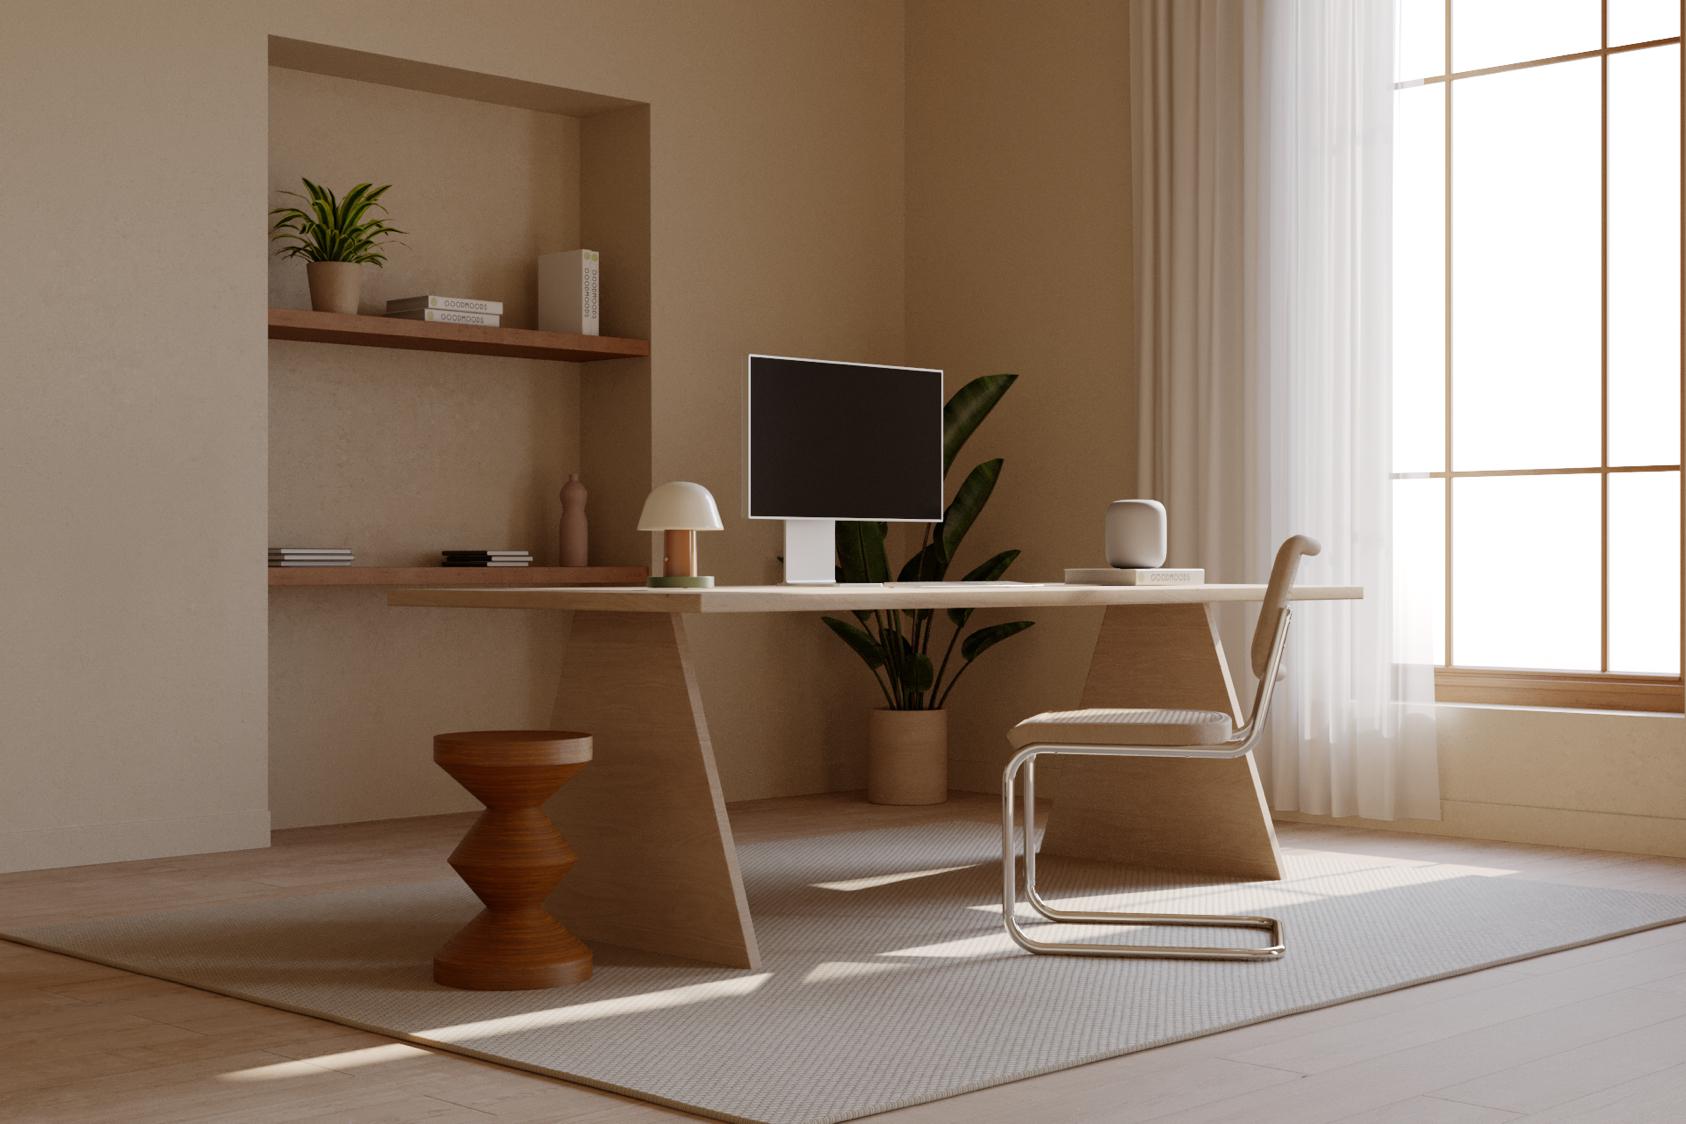 Fleex desk with computer